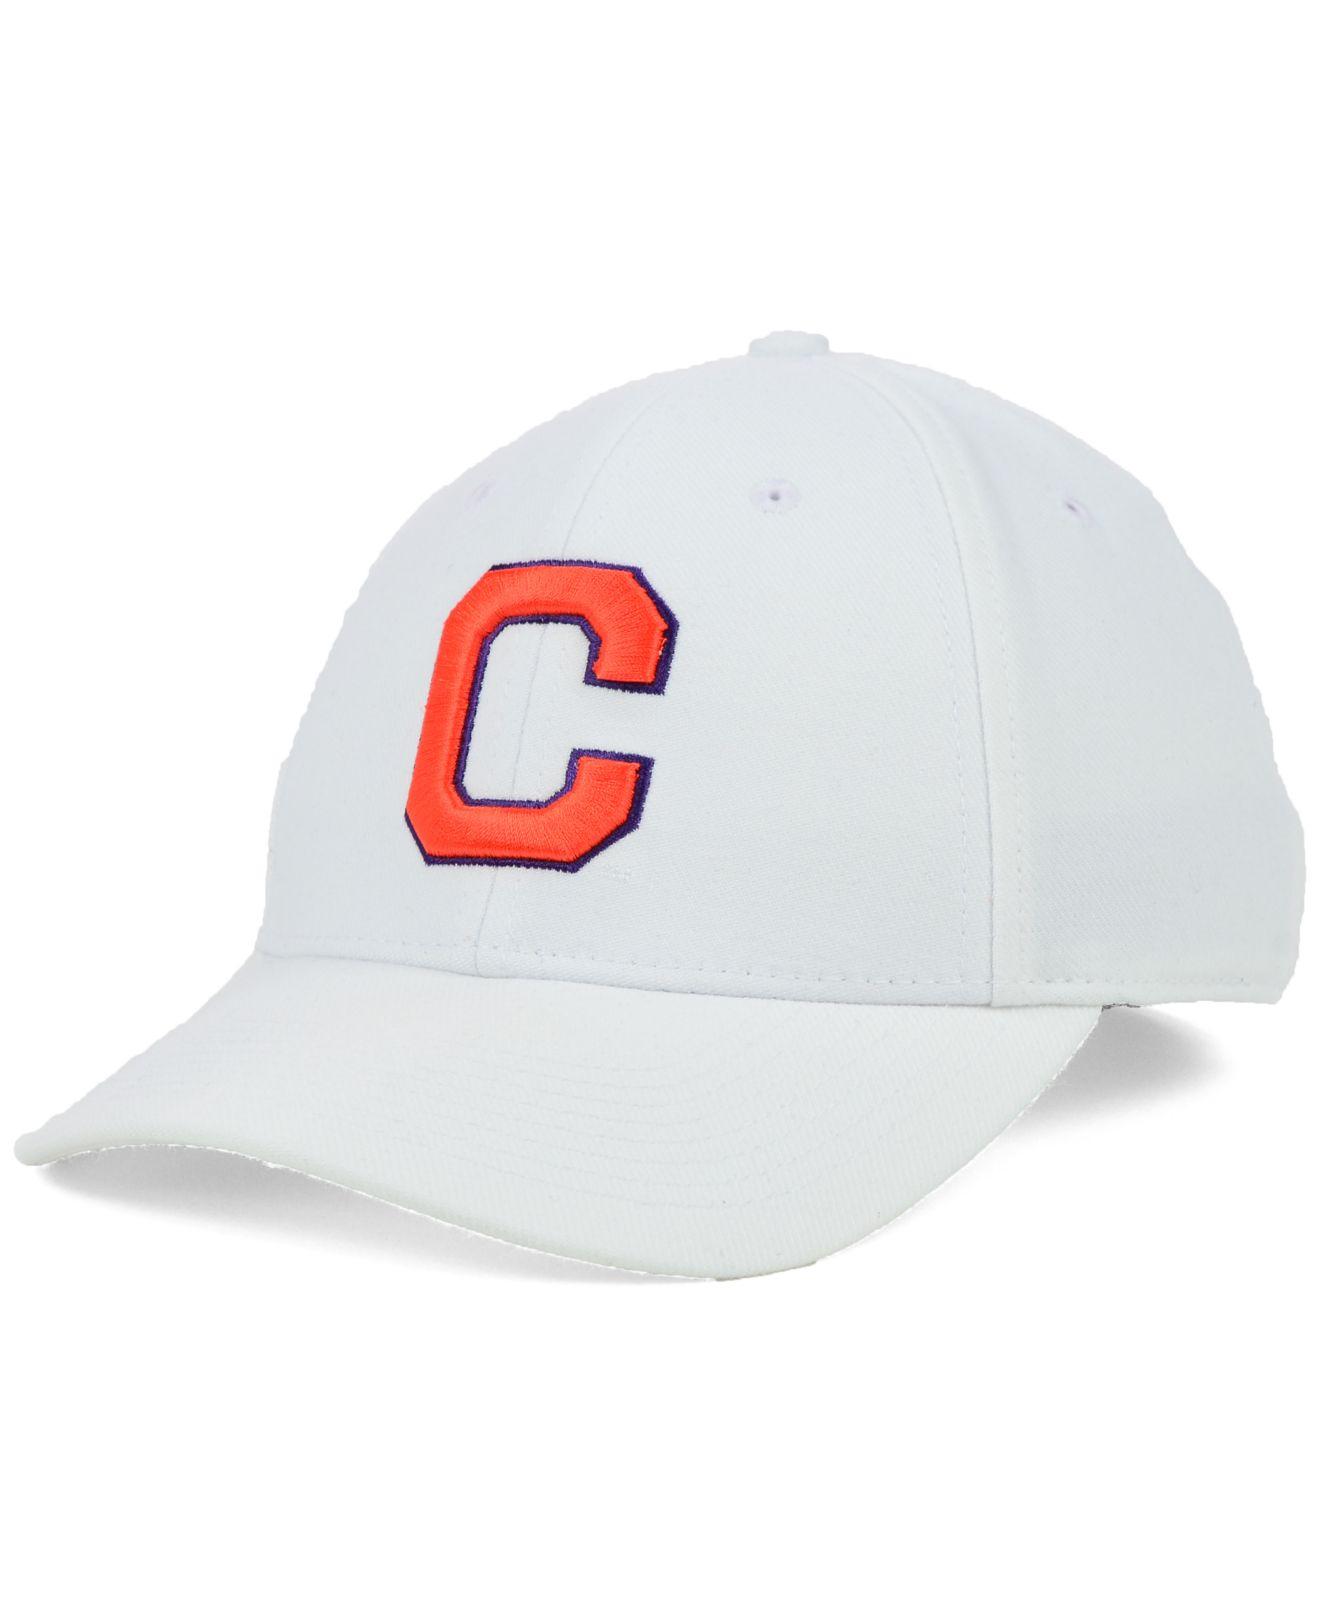 bc96807b740 ... ebay lyst nike clemson tigers dri fit swooshflex cap in white for men  f706c 05ce9